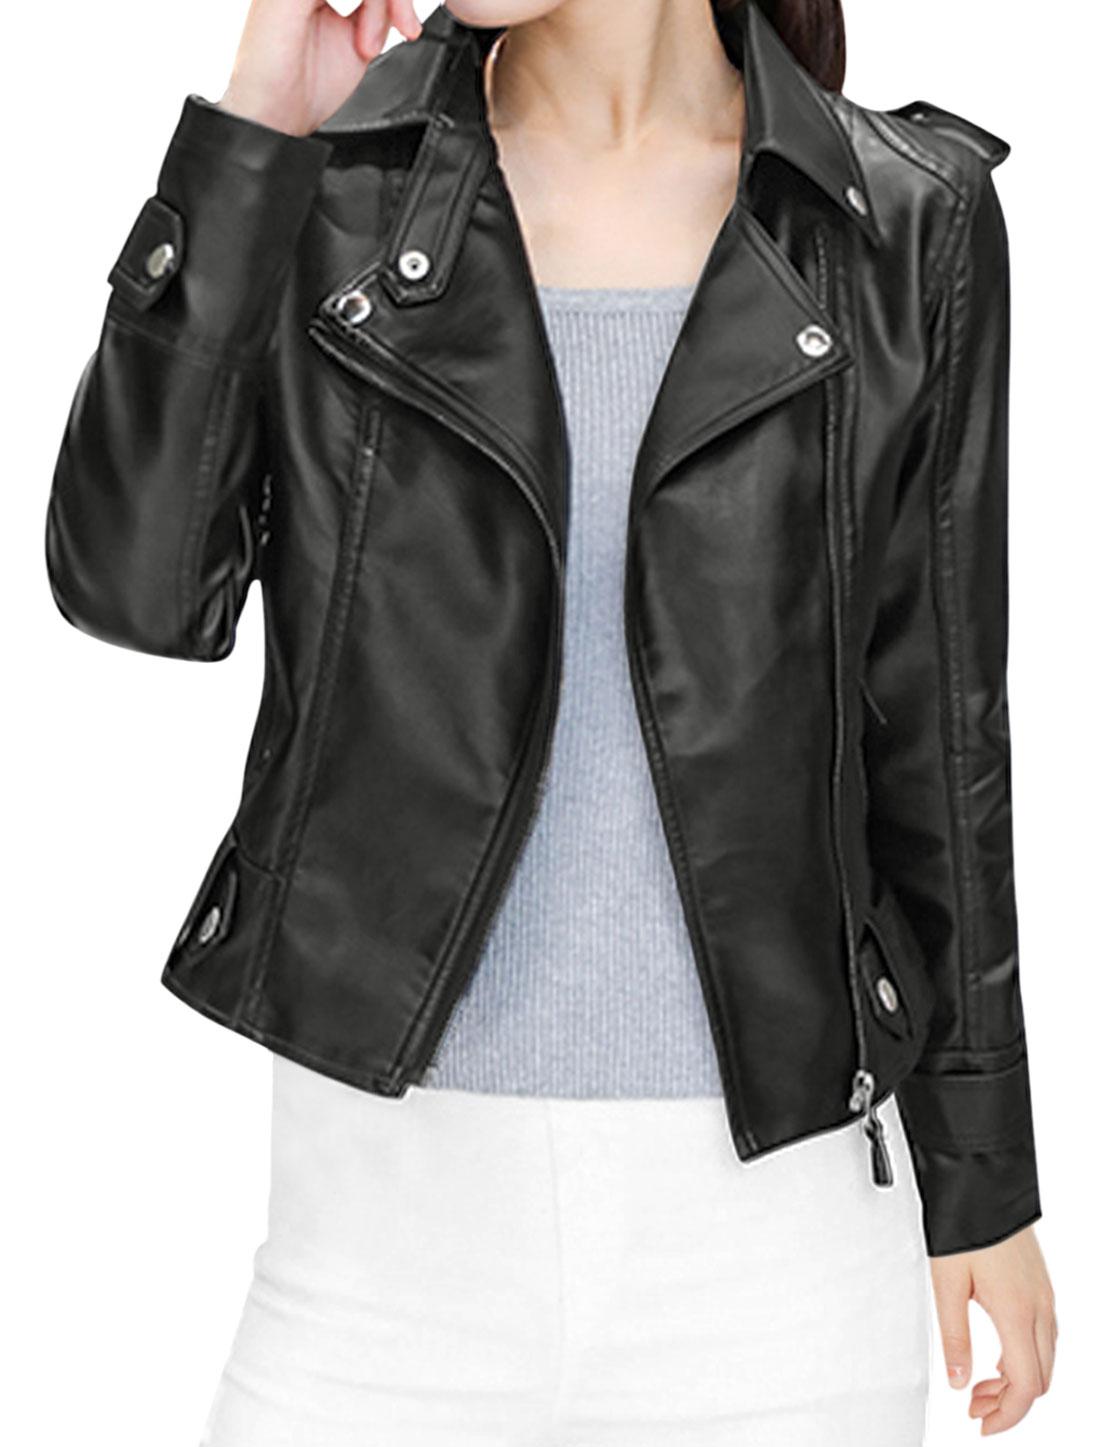 Women Convertible Collar Long Sleeves Buttoned Zip Up PU Jacket Black XS